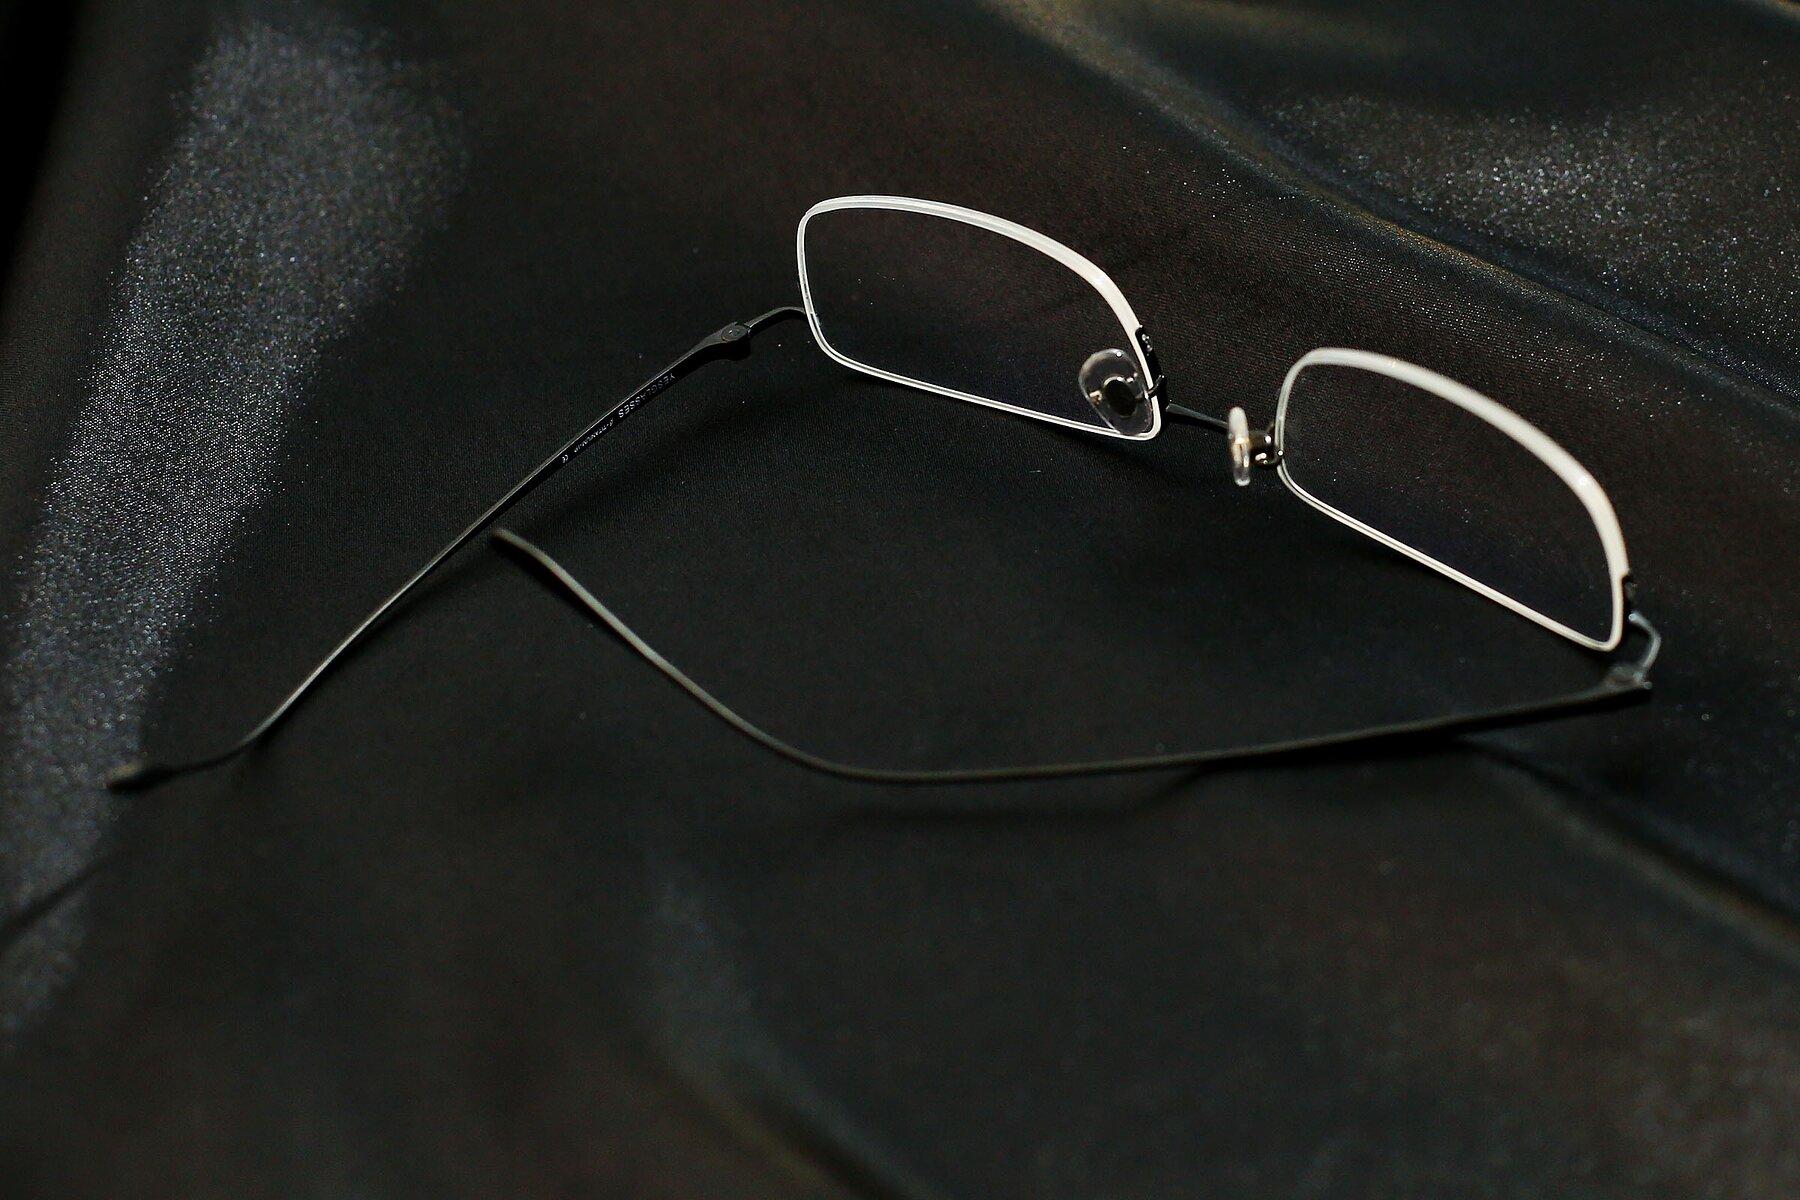 Lifestyle photography #4 of Duke in Matt Black with Clear Eyeglass Lenses